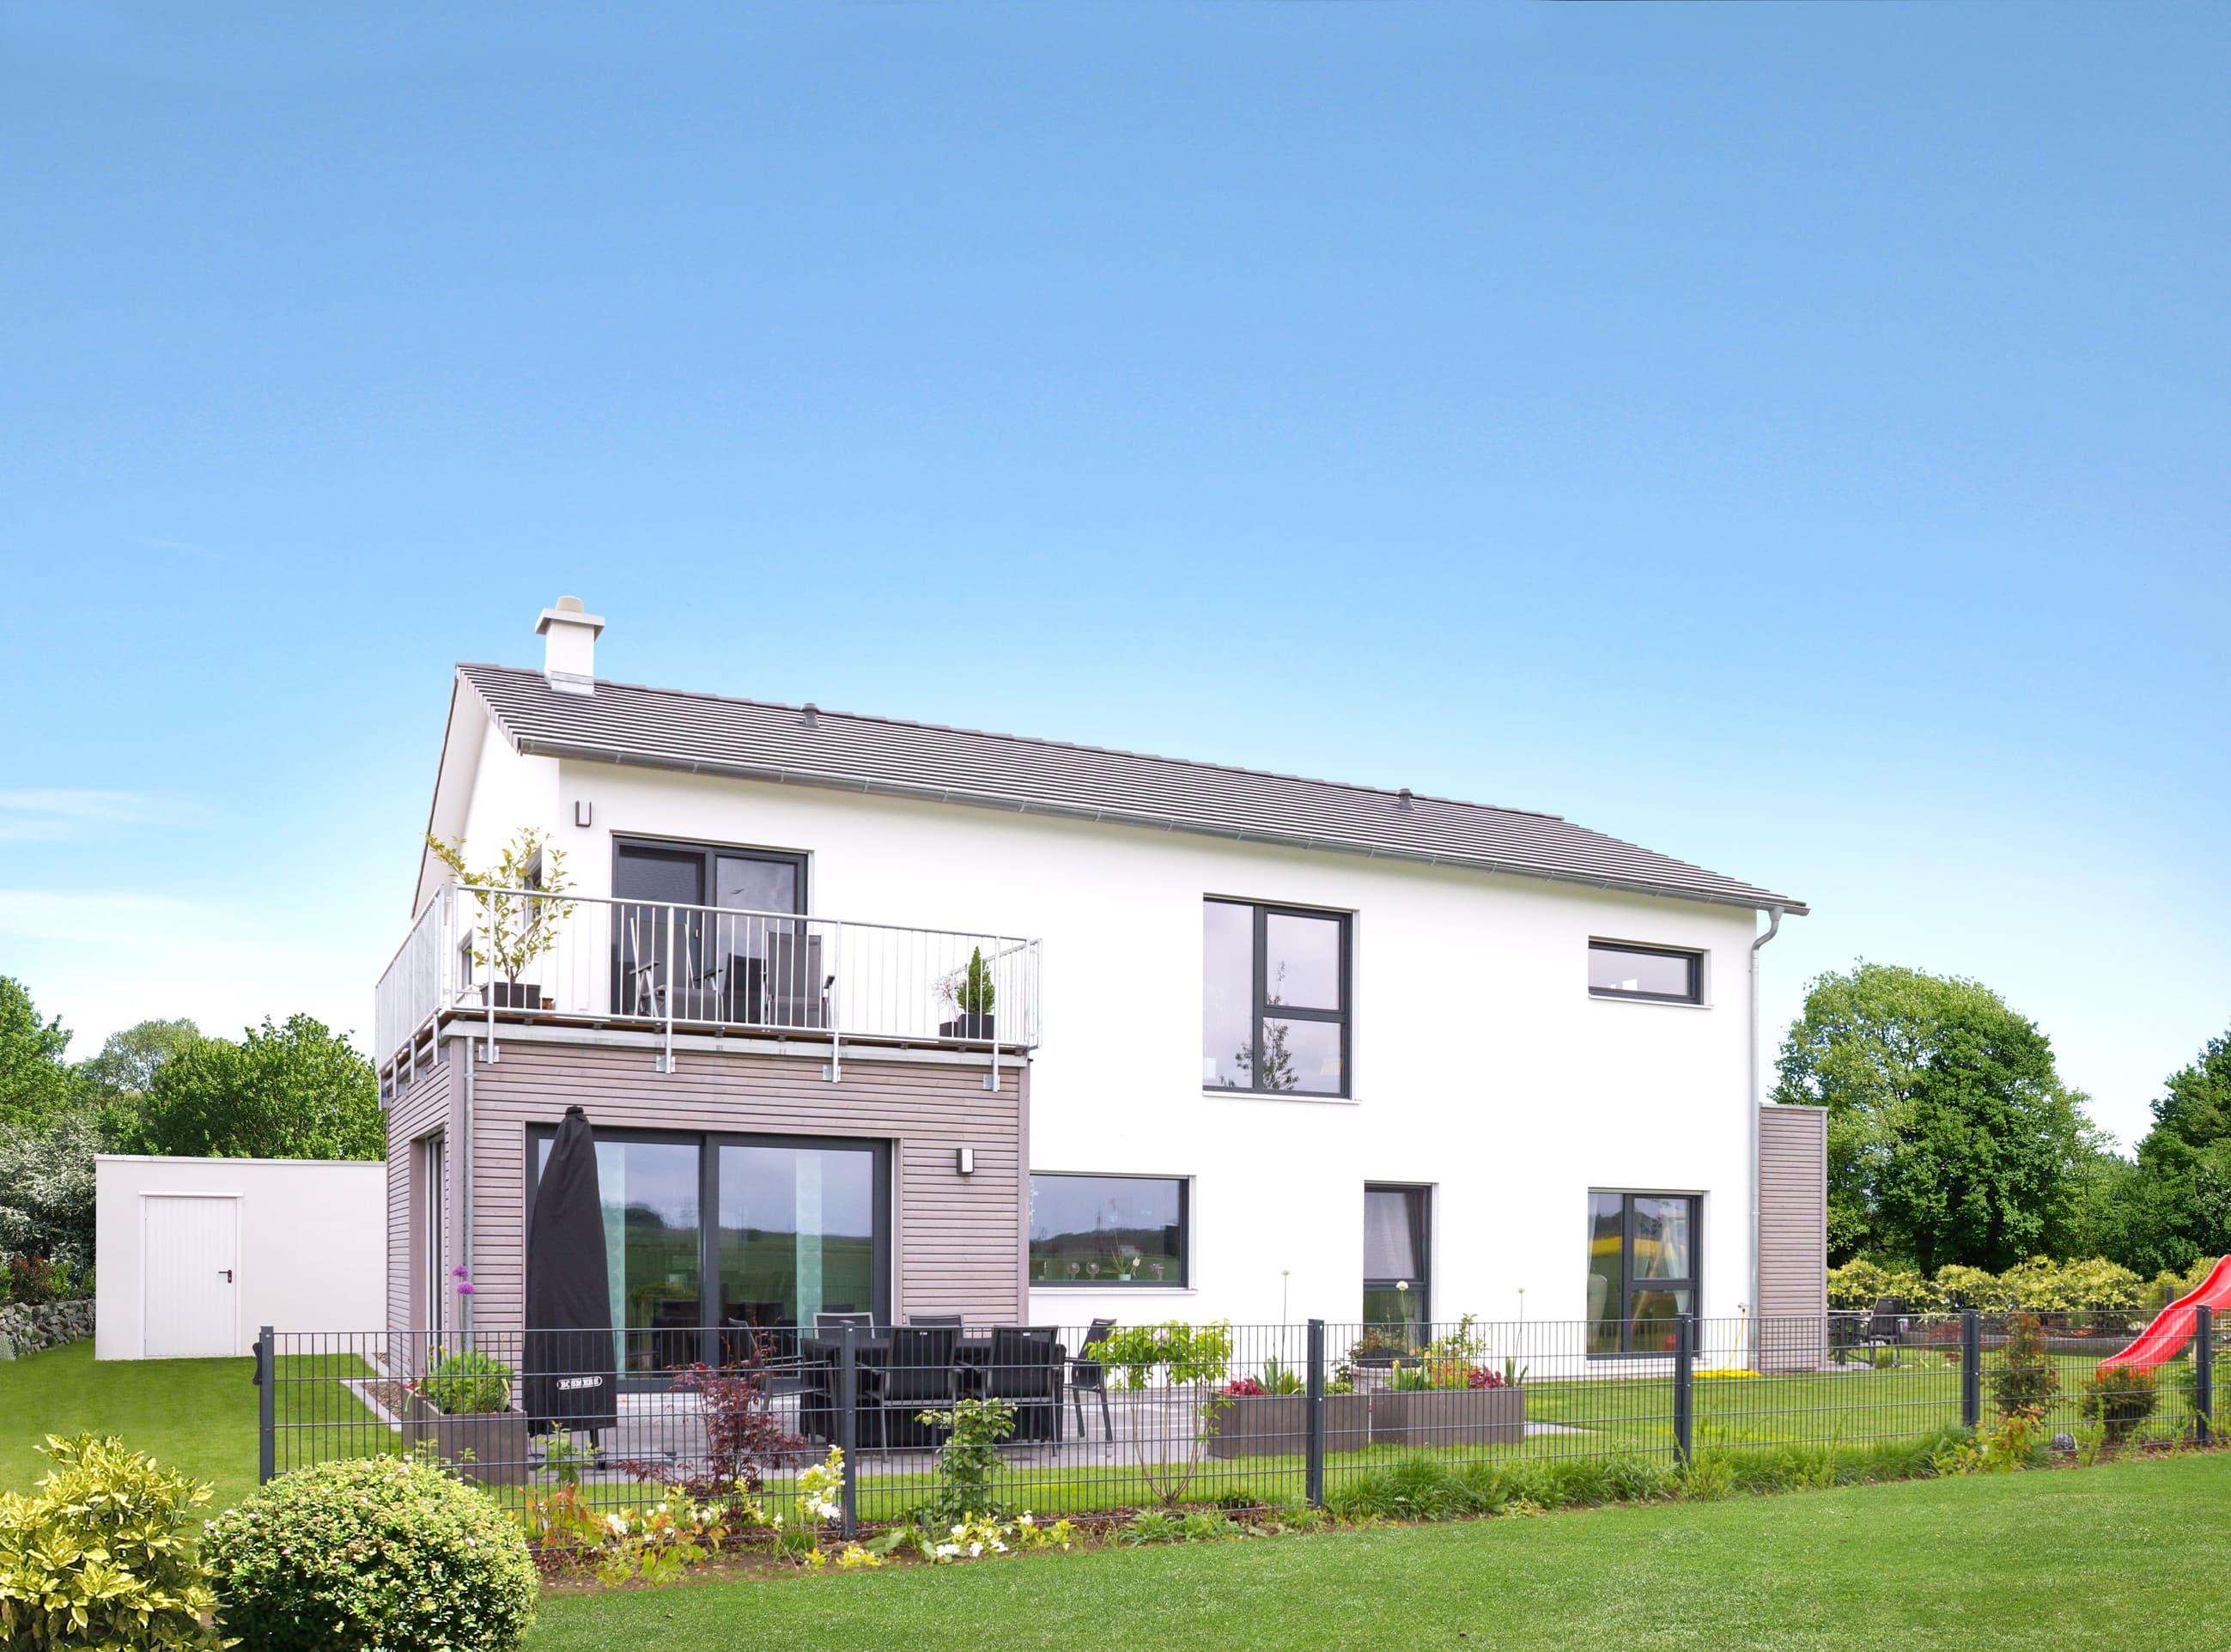 homestory 342 lehner haus gmbh anbieter. Black Bedroom Furniture Sets. Home Design Ideas